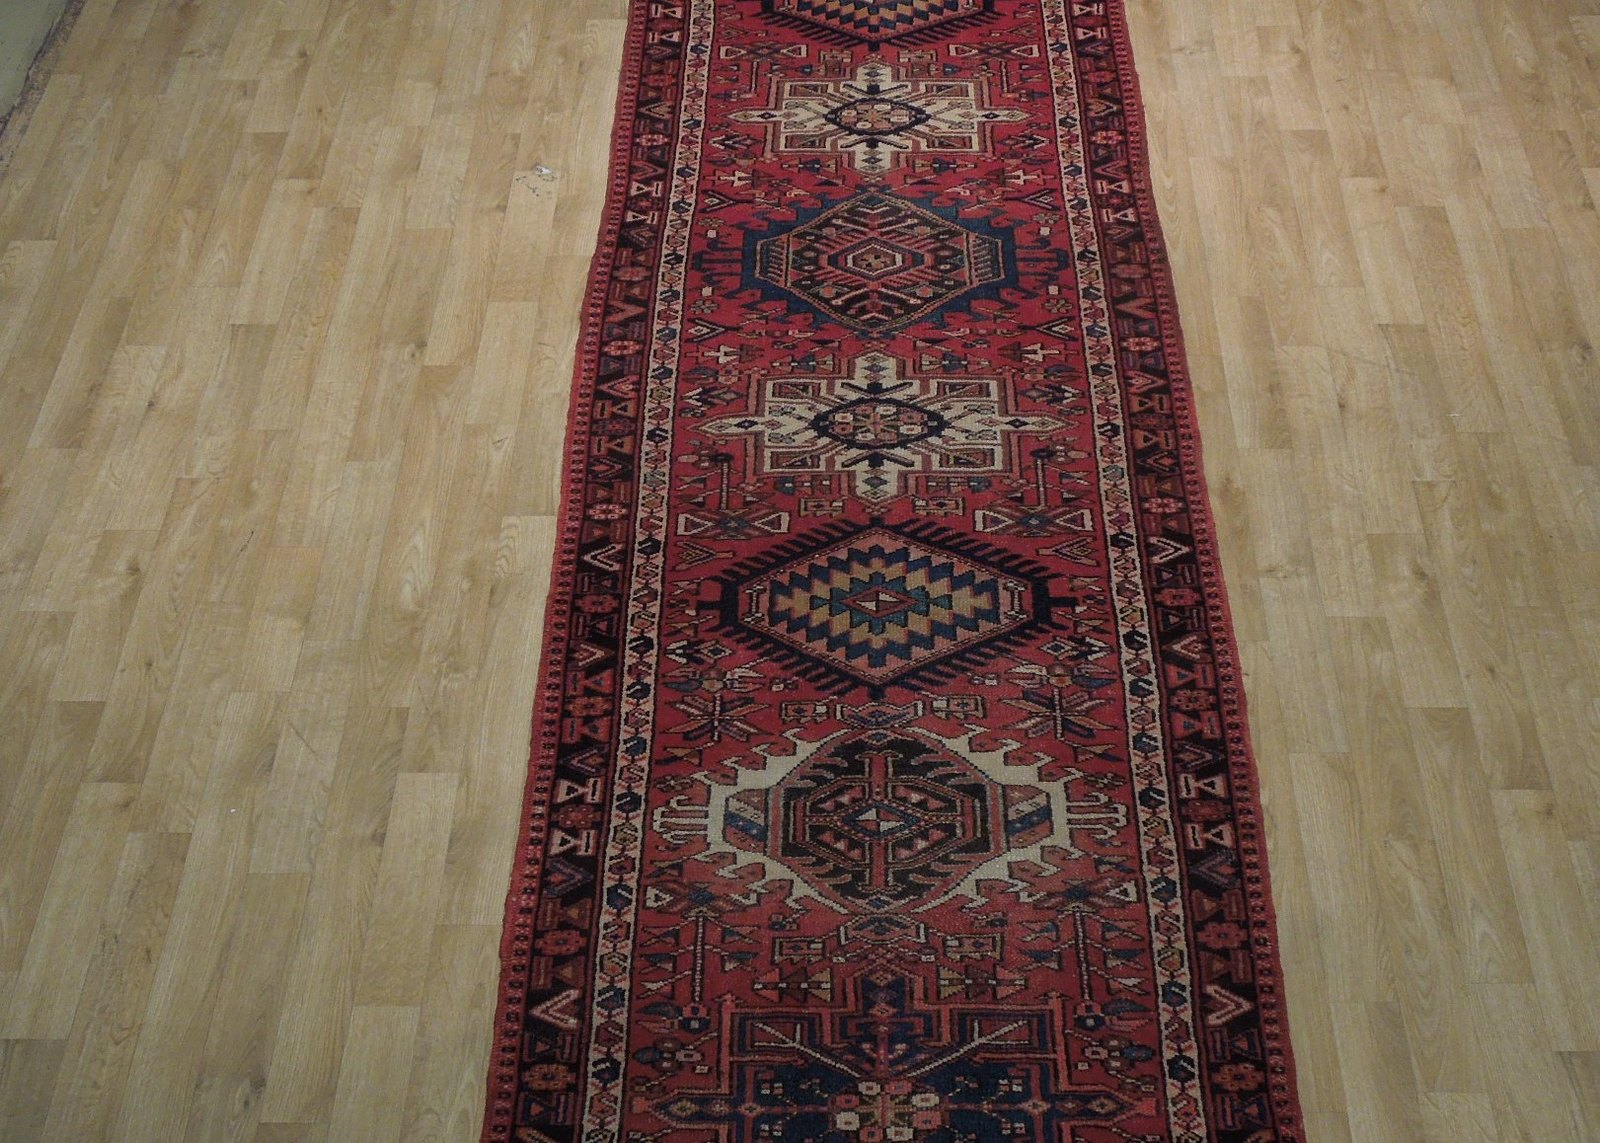 Red 3 x 13 All-Over Classic Tribal Design Runner Karaja Persian Handmade Rug image 12